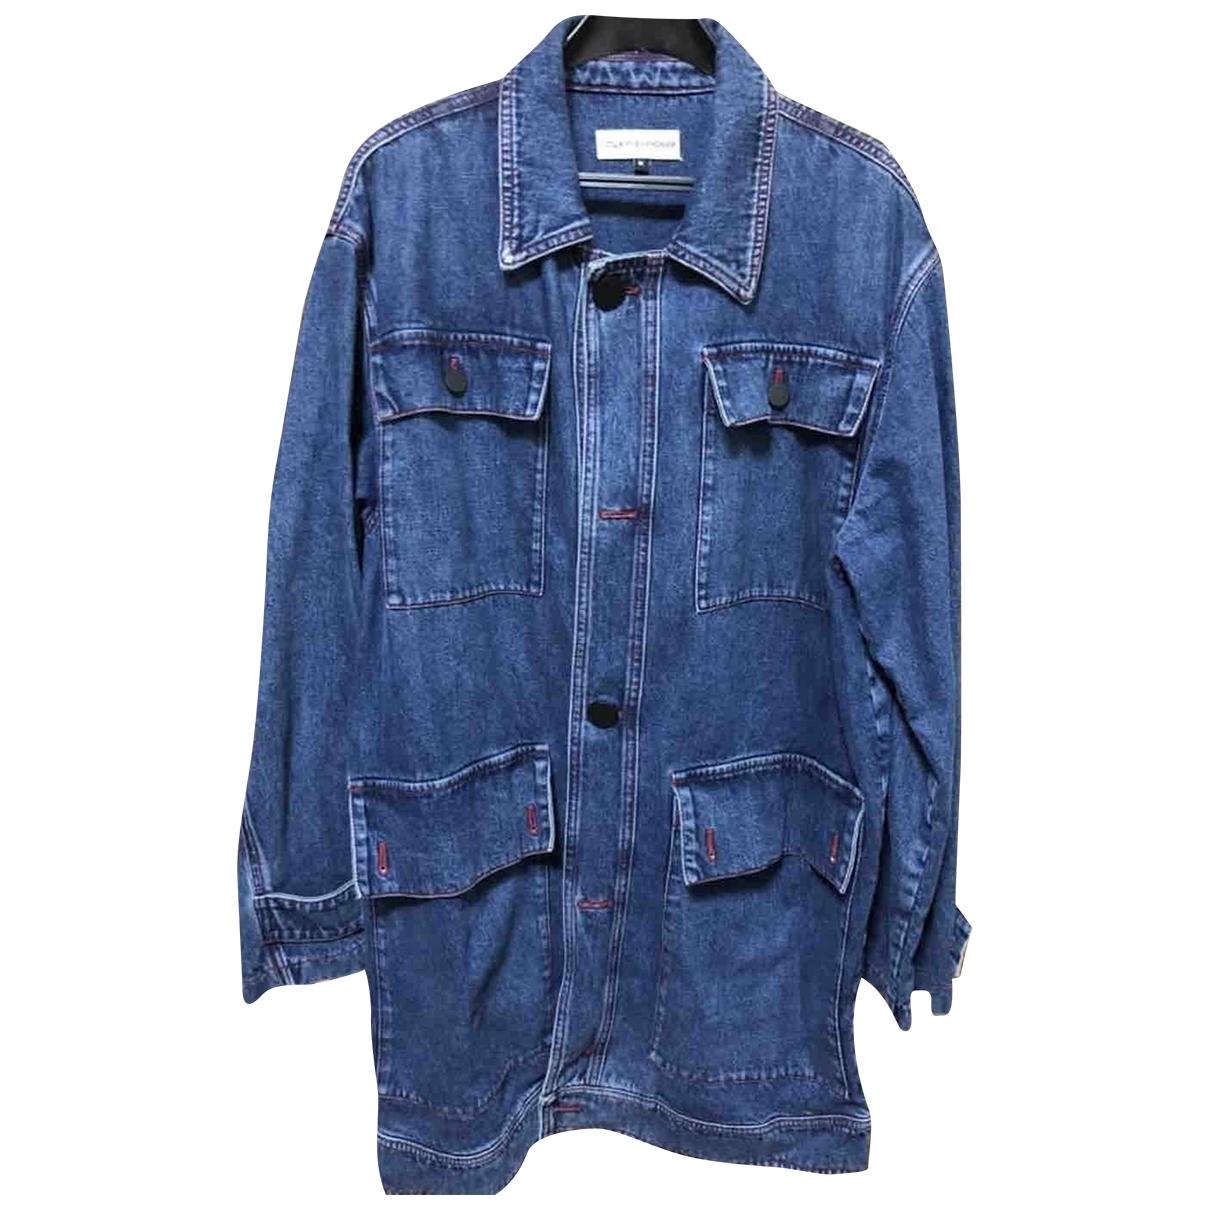 Gosha Rubchinskiy \N Blue Denim - Jeans jacket  for Men M International